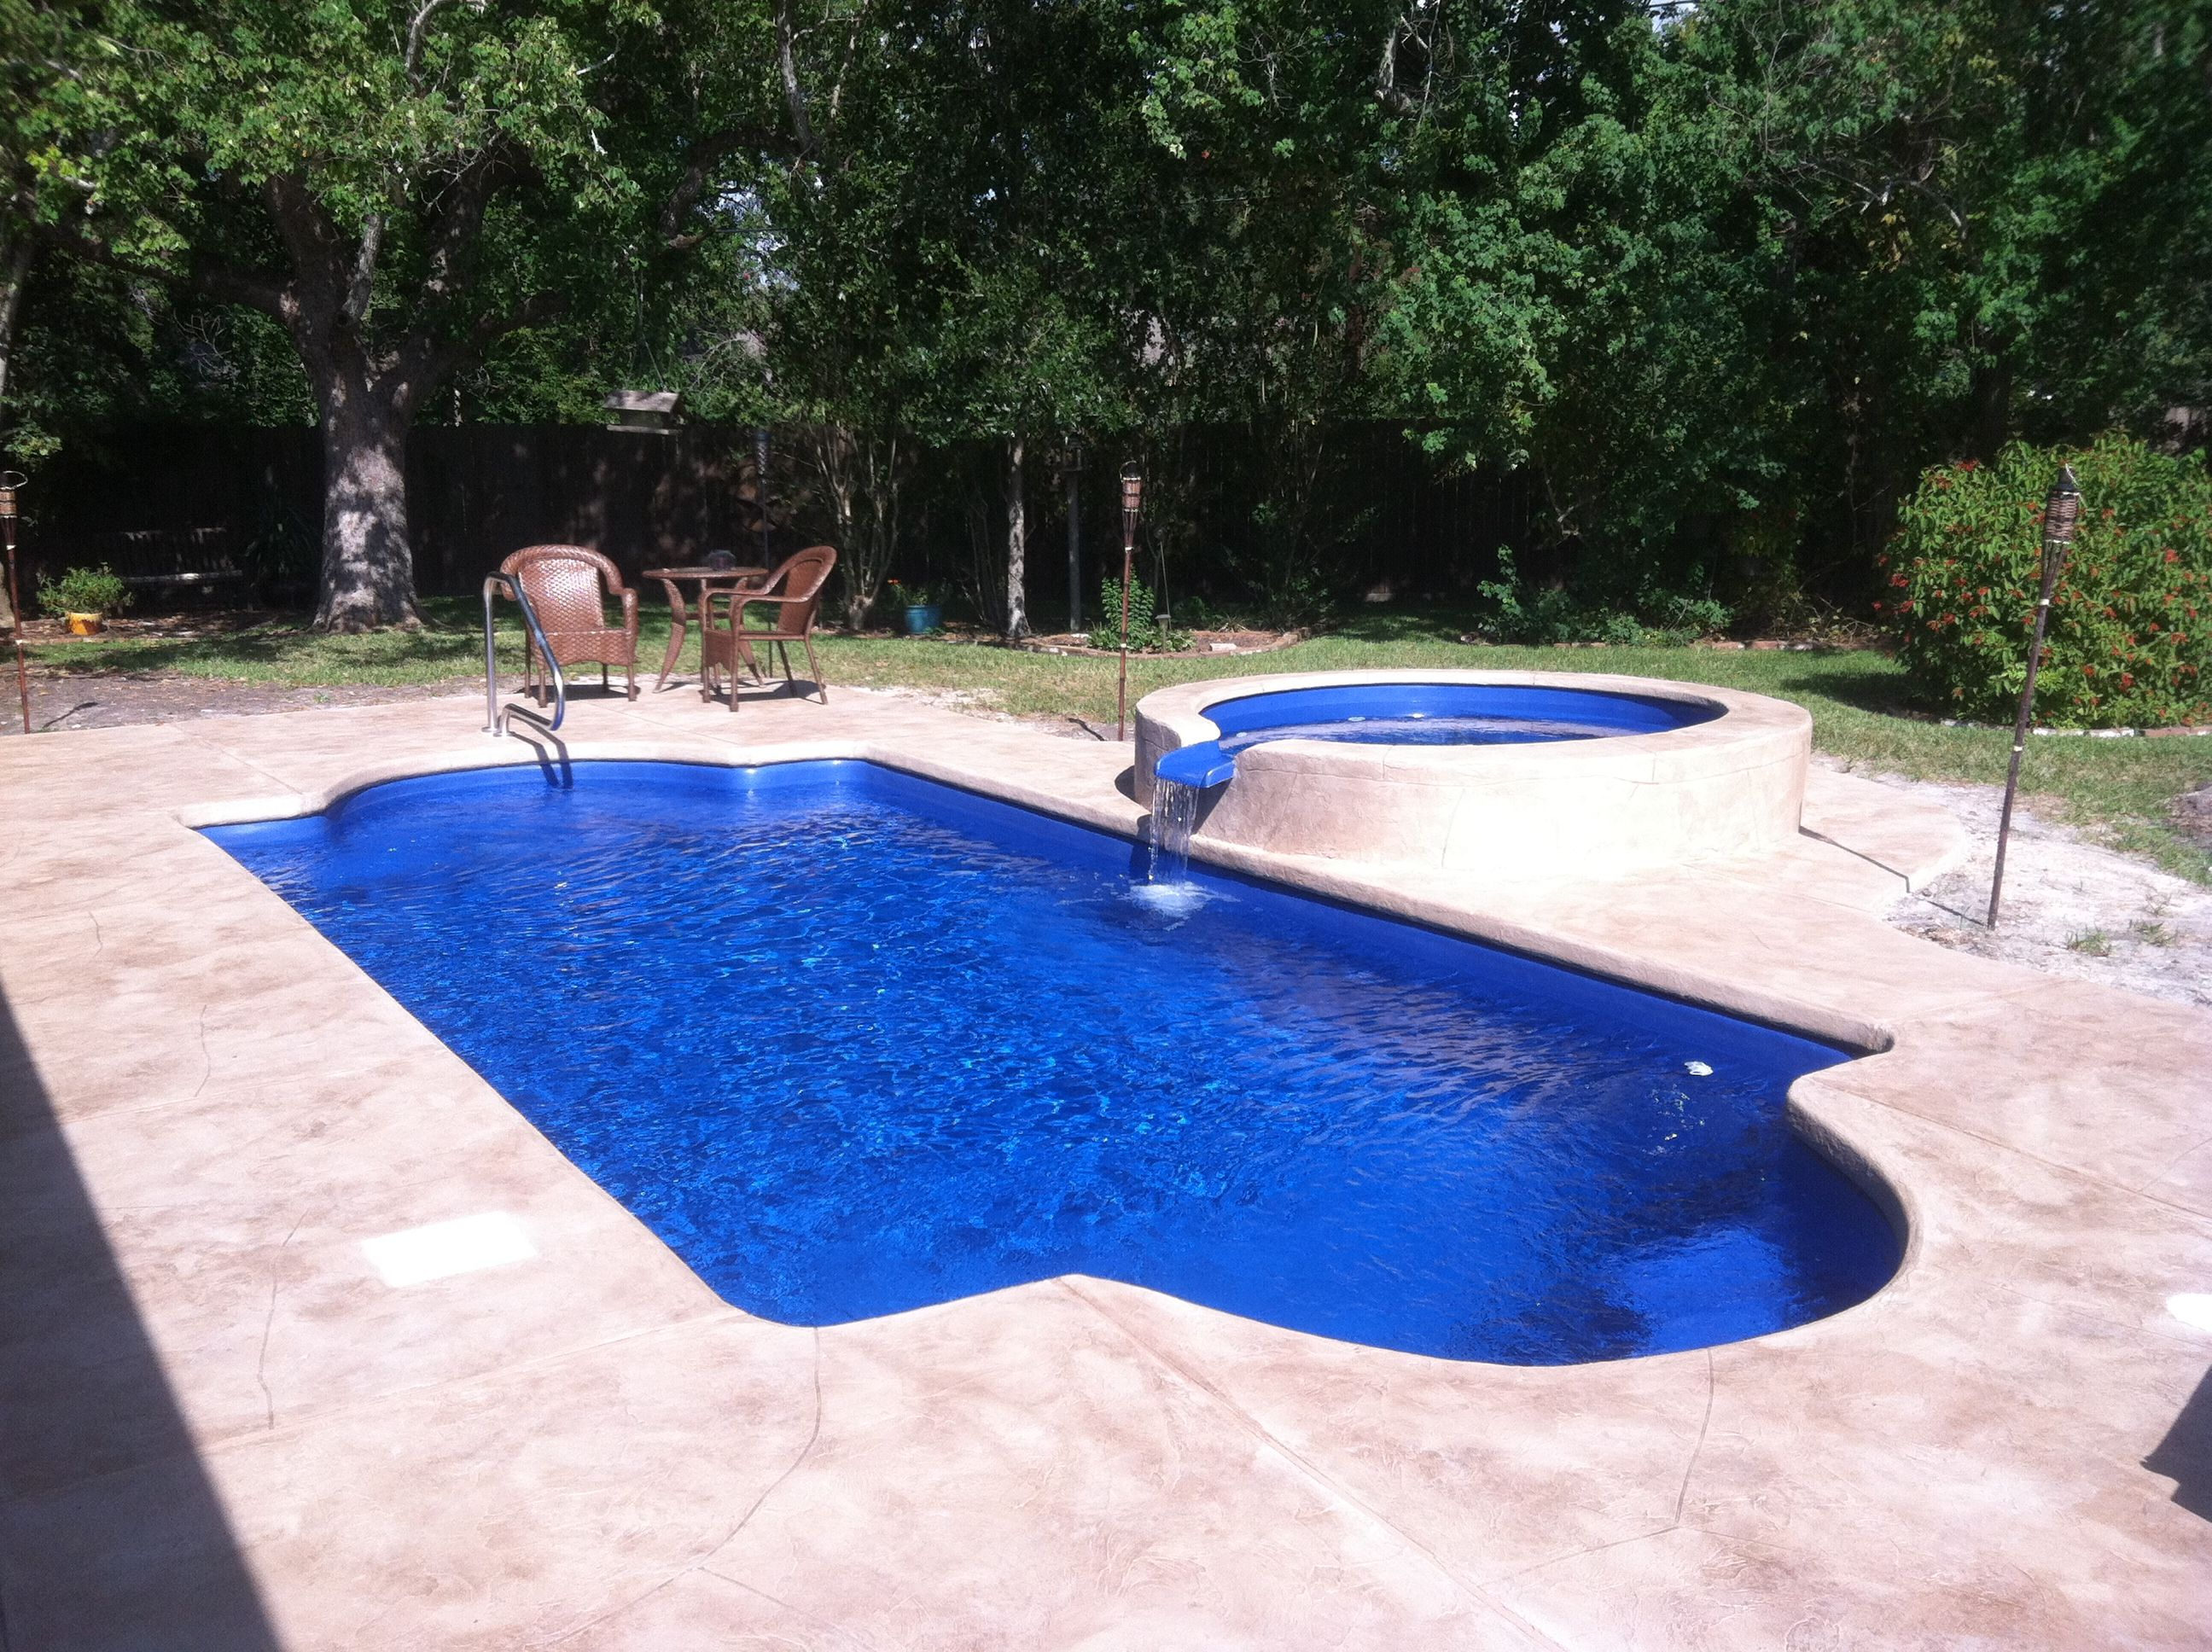 Swimming Pool Minimalist Design Fiberglass Swimming Pool And Spa For